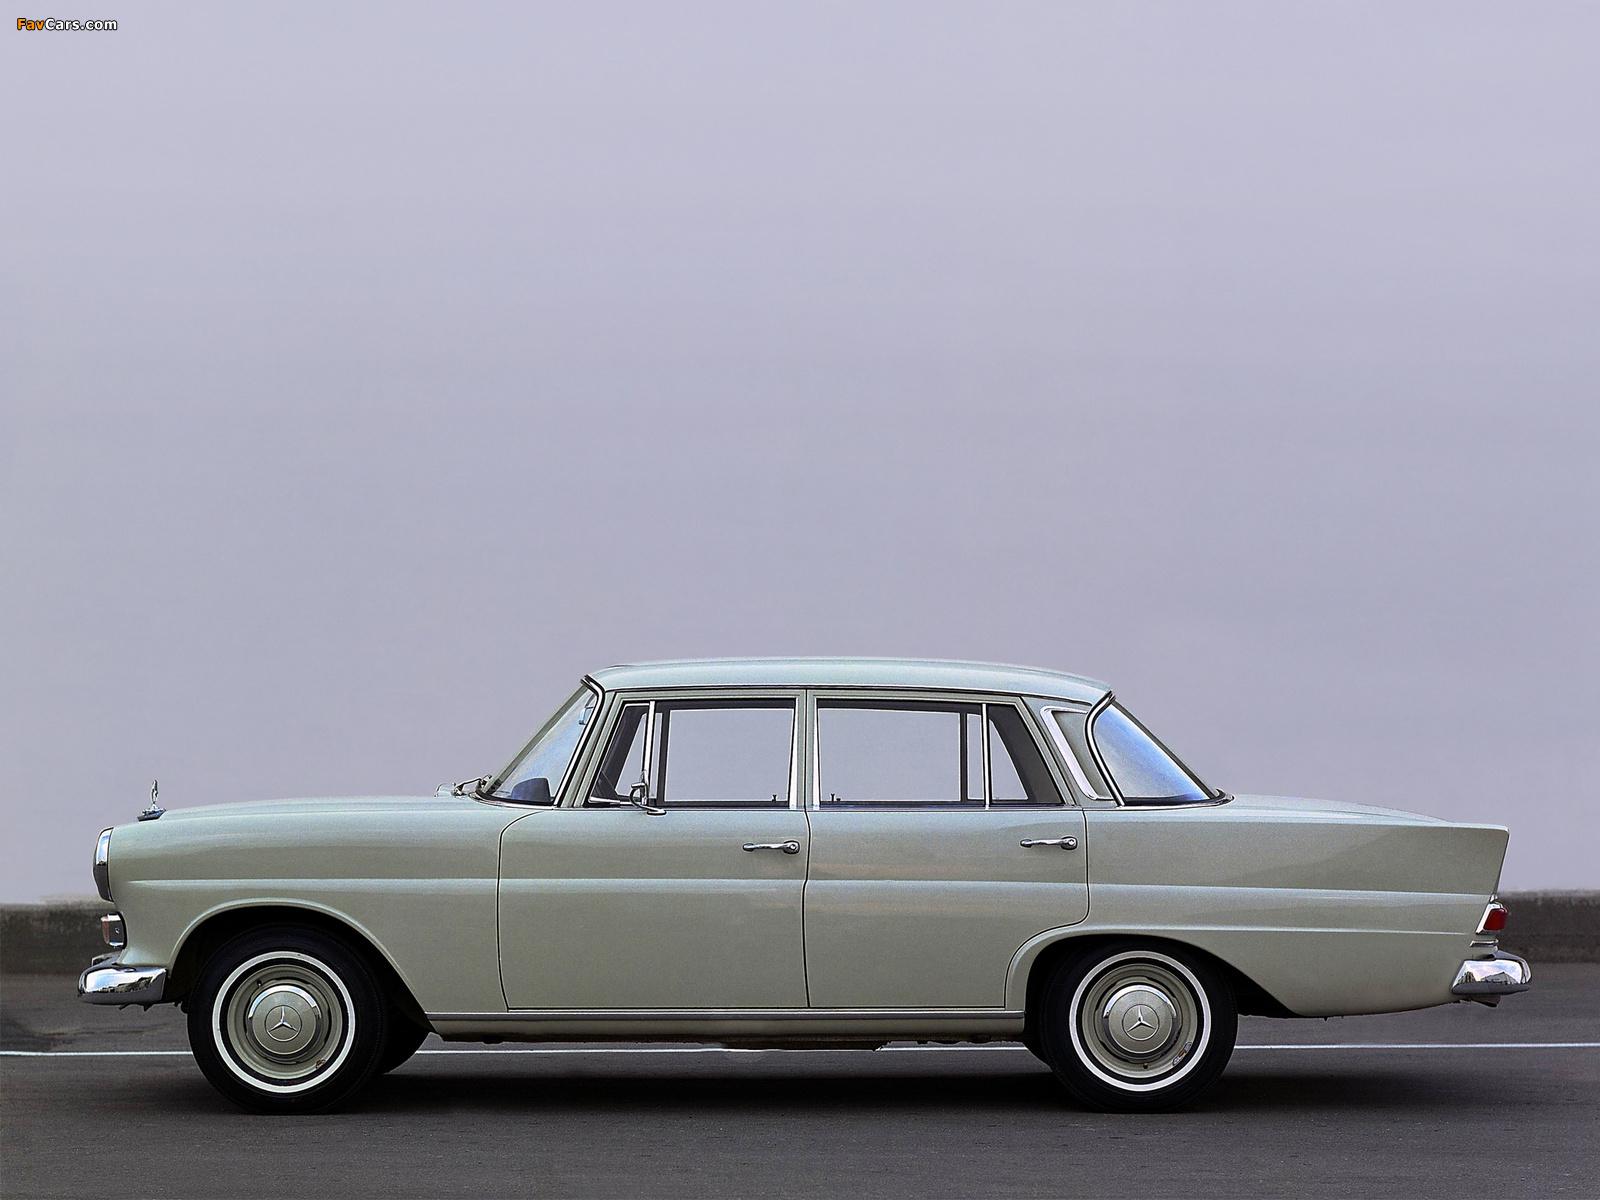 Mercedes benz 280sl car vehicl wrap mercedes benz merced pagoda - Filename Pictures_mercedes Benz_w110 Fintail_1965_1 Jpg